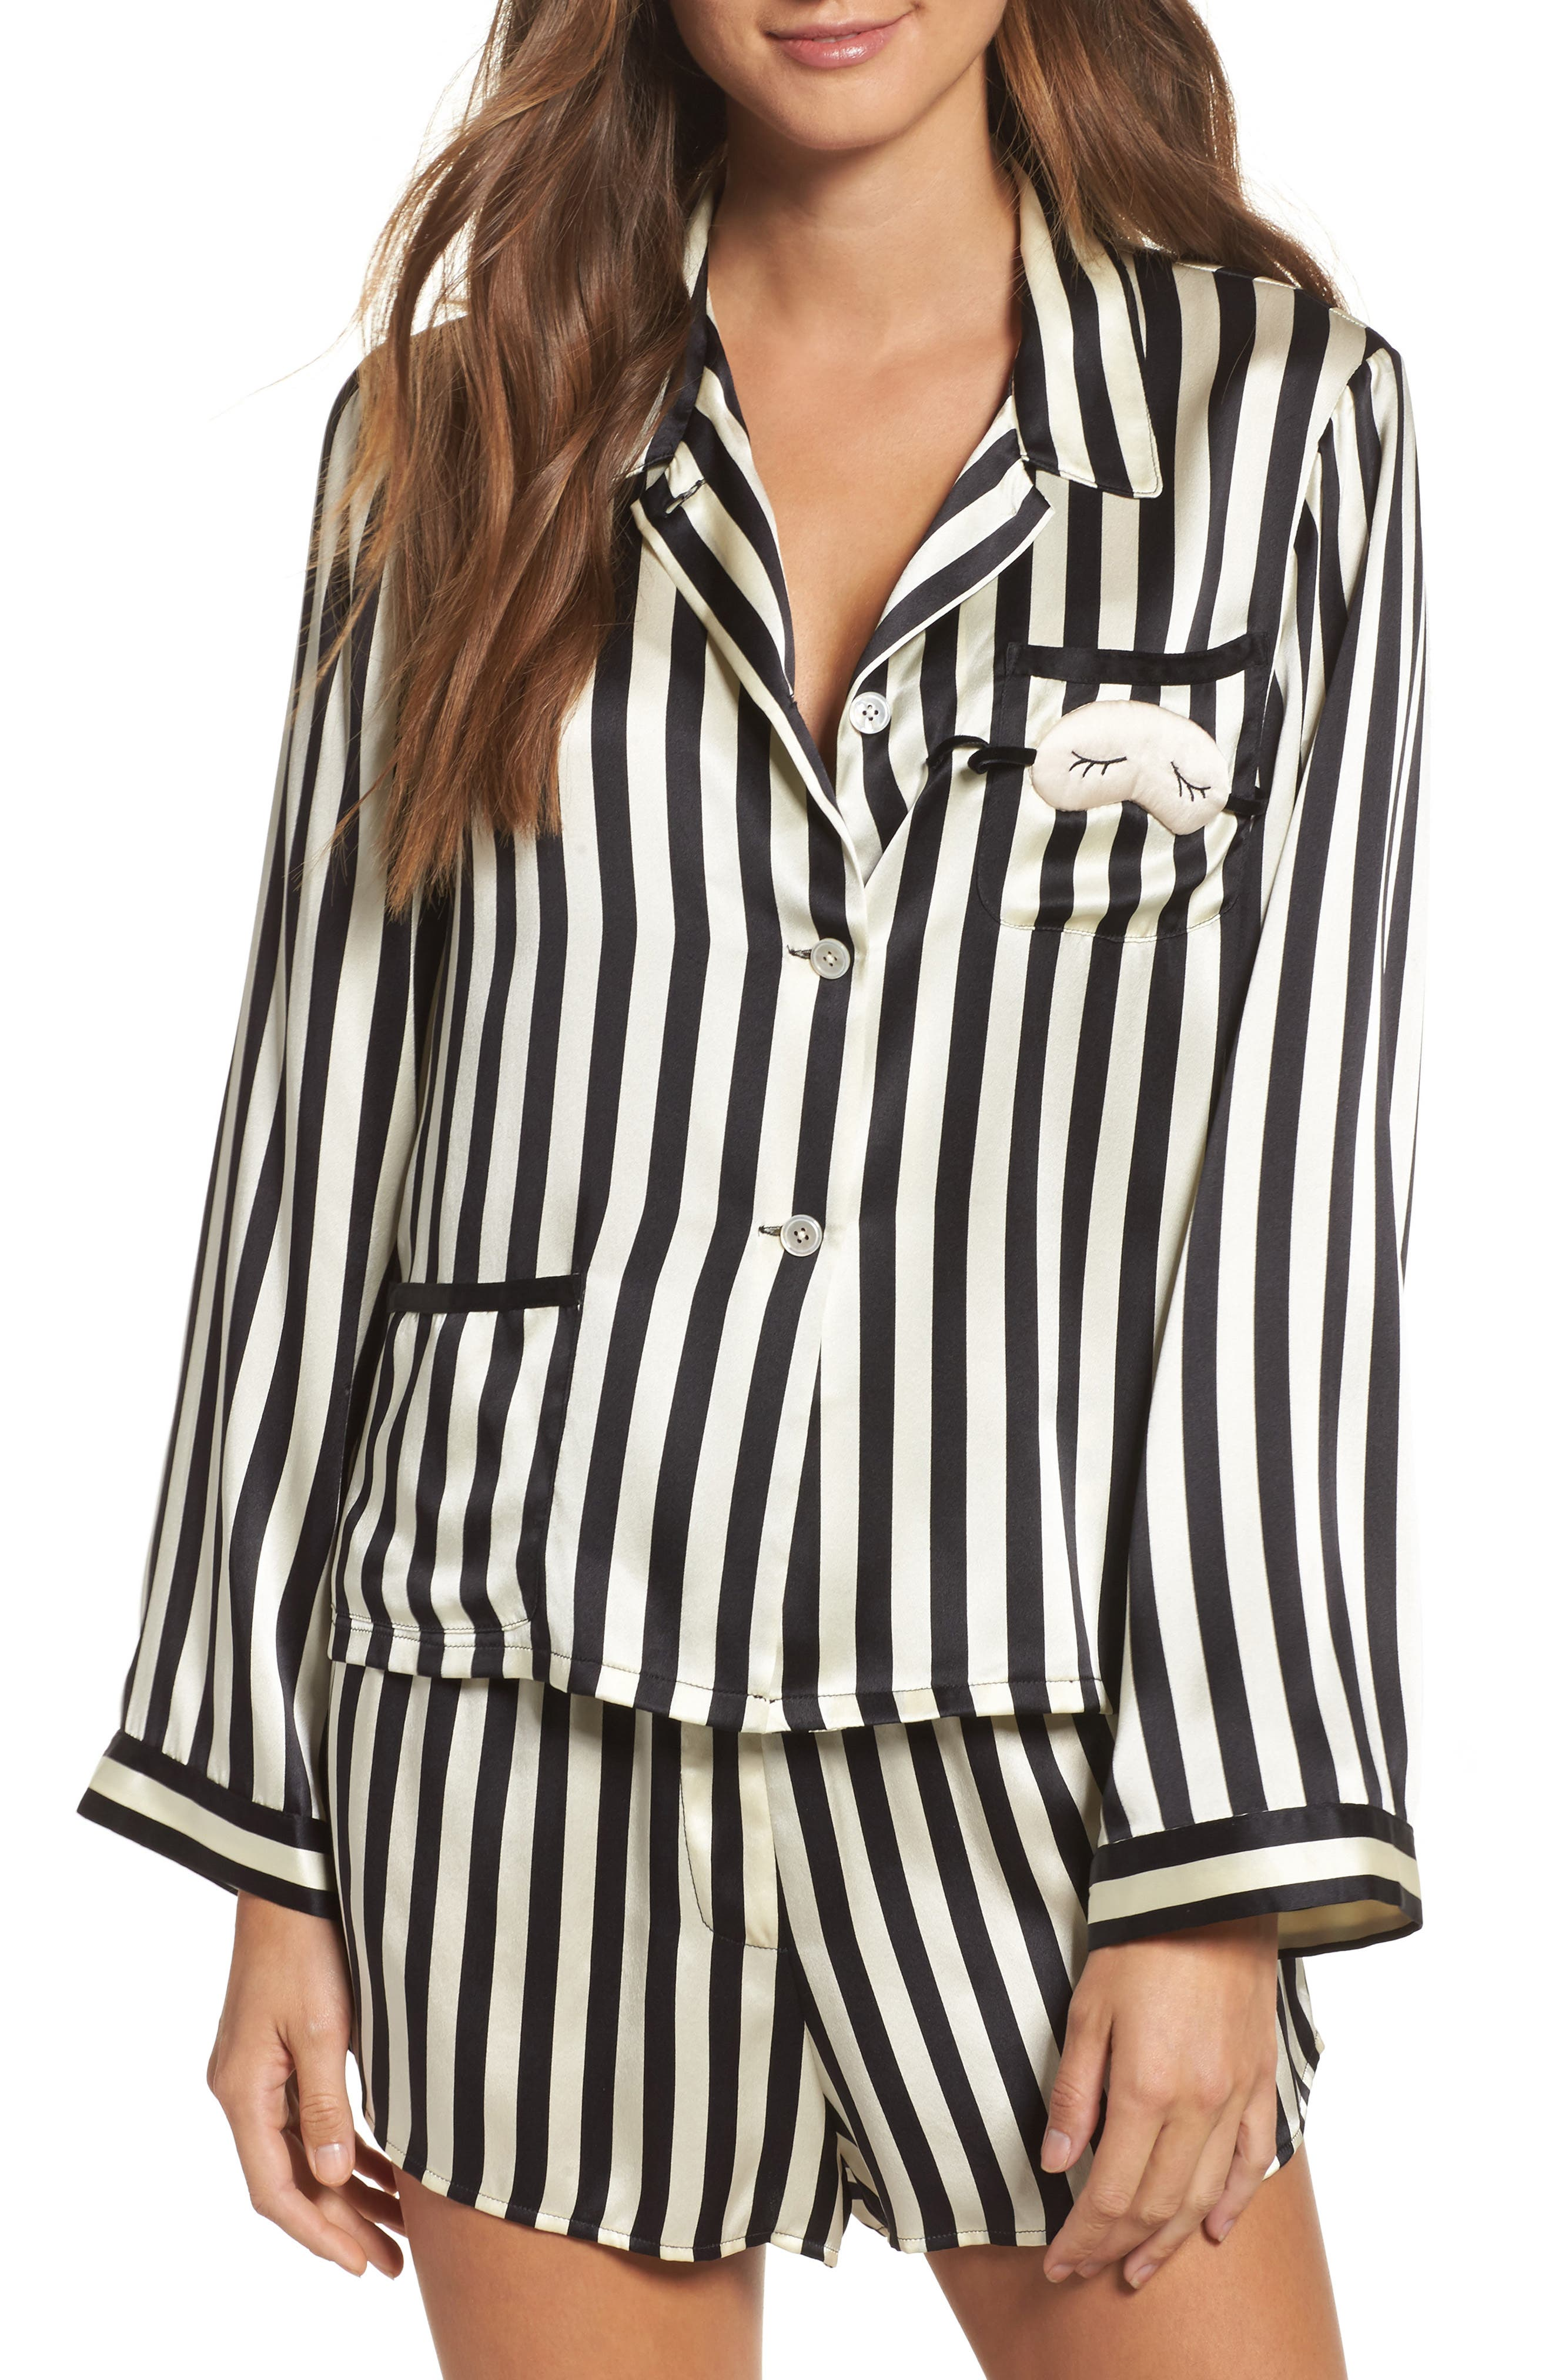 Main Image - Morgan Lane x Amanda Fatherazi Ruthie Mini Mask Stripe Pajama Top